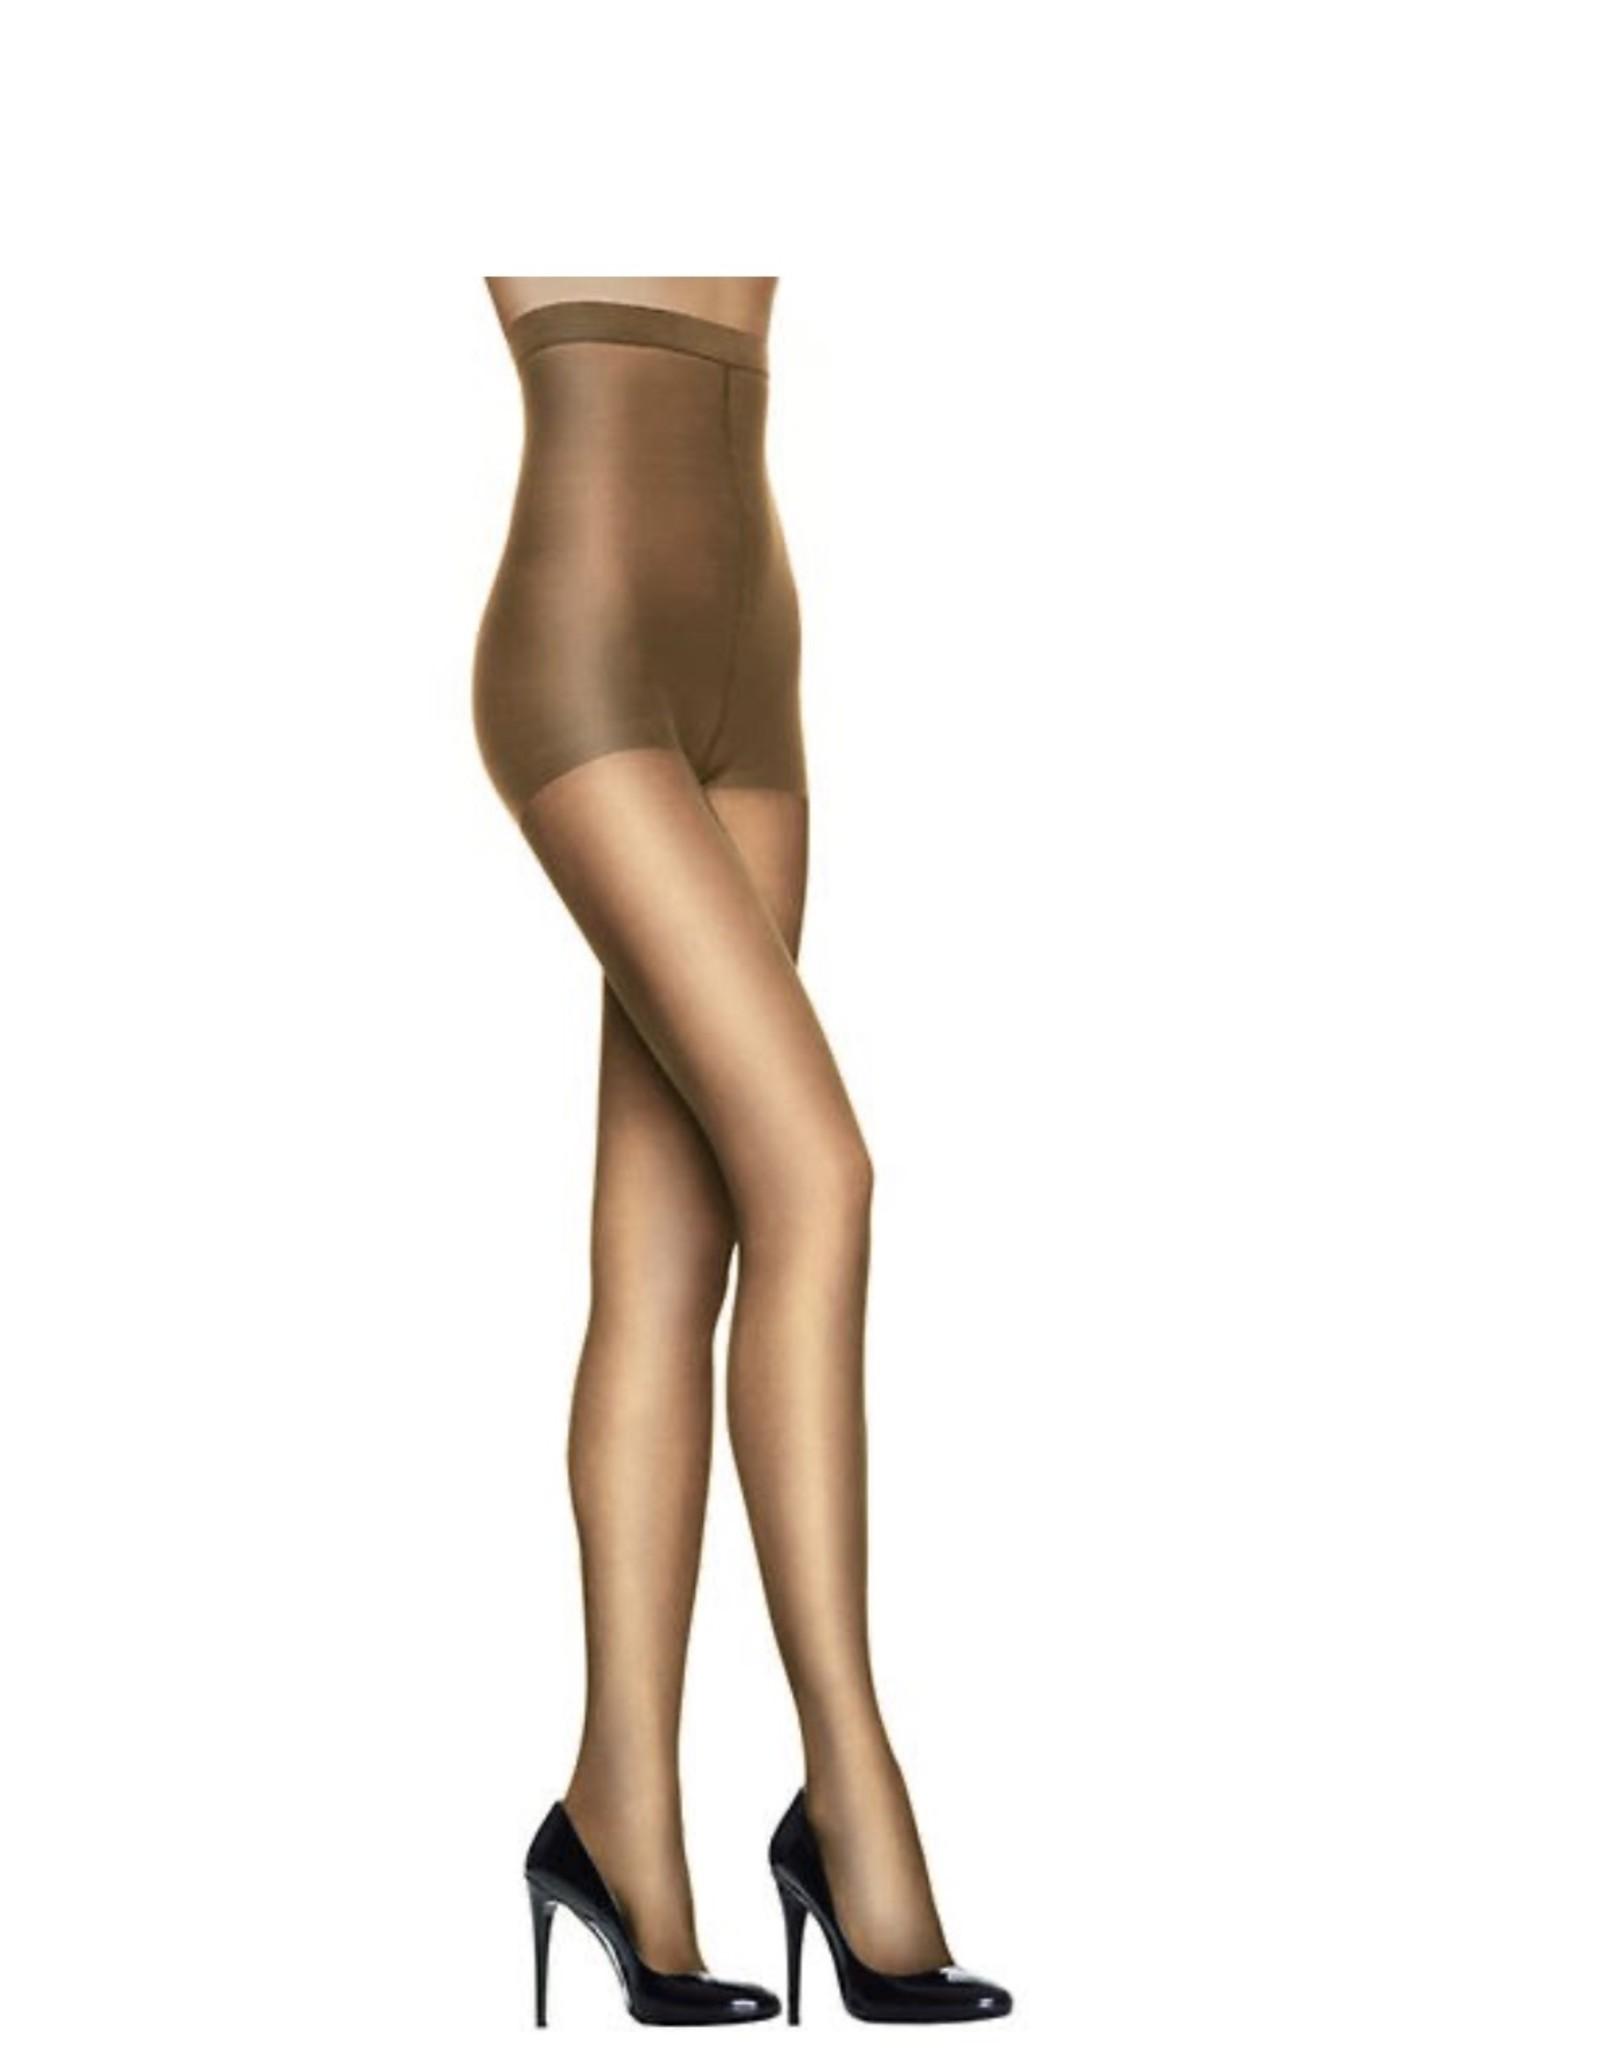 Hanes Hanes Women's High Waist Control Top Sheer Toe Pantyhose OB184